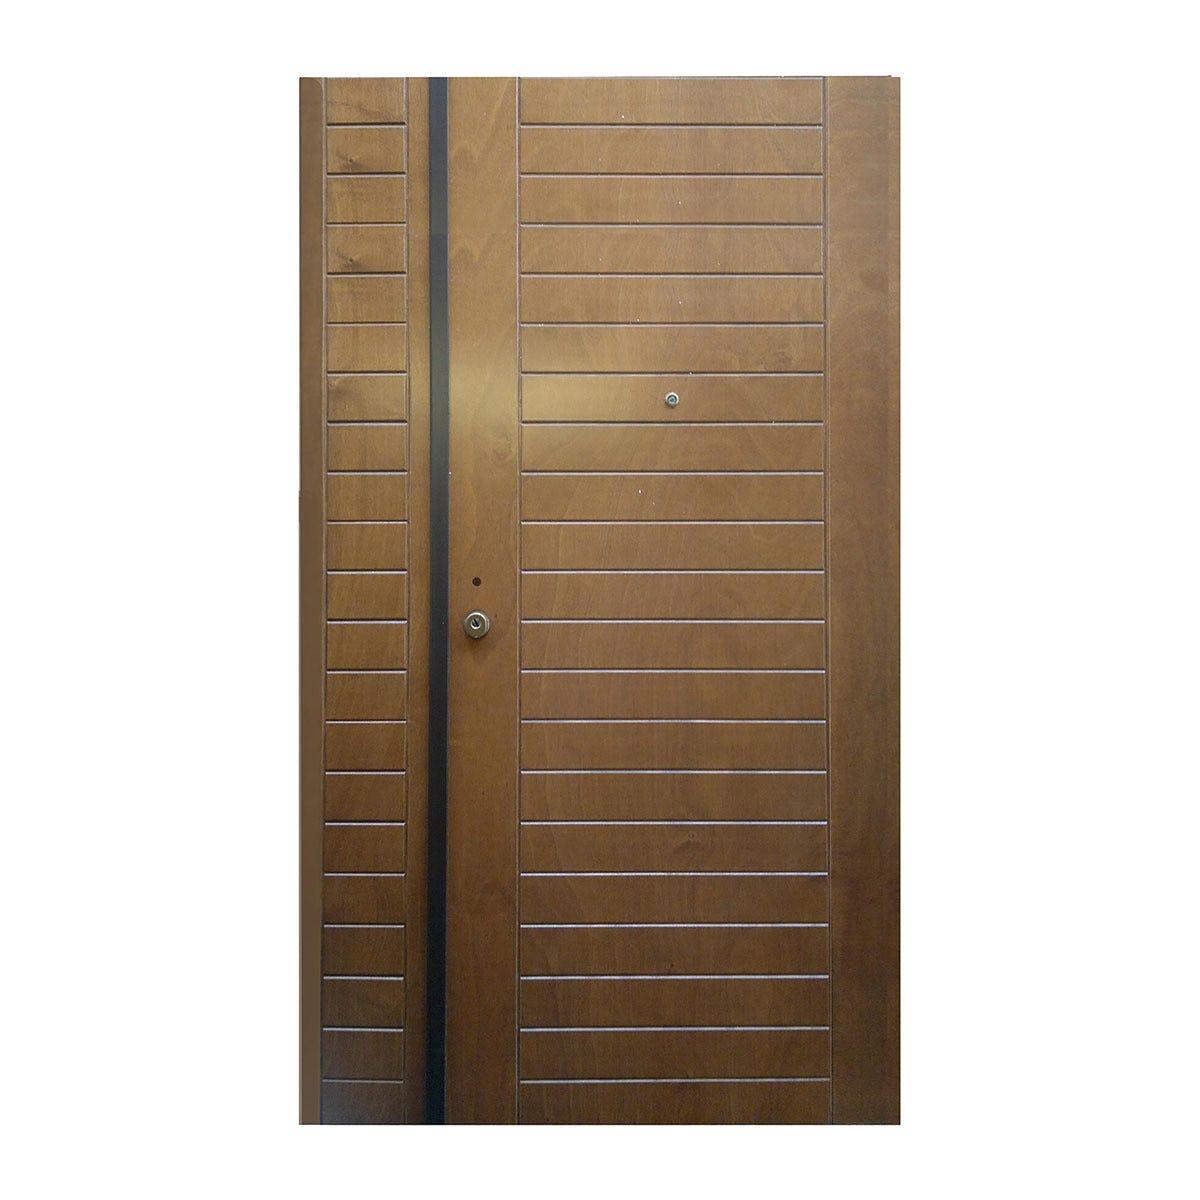 Porta Blindata Hammer Doppia Anta Apertura Spinta A Sinistra 210x90/30 Cm (Hxl) Classe 3